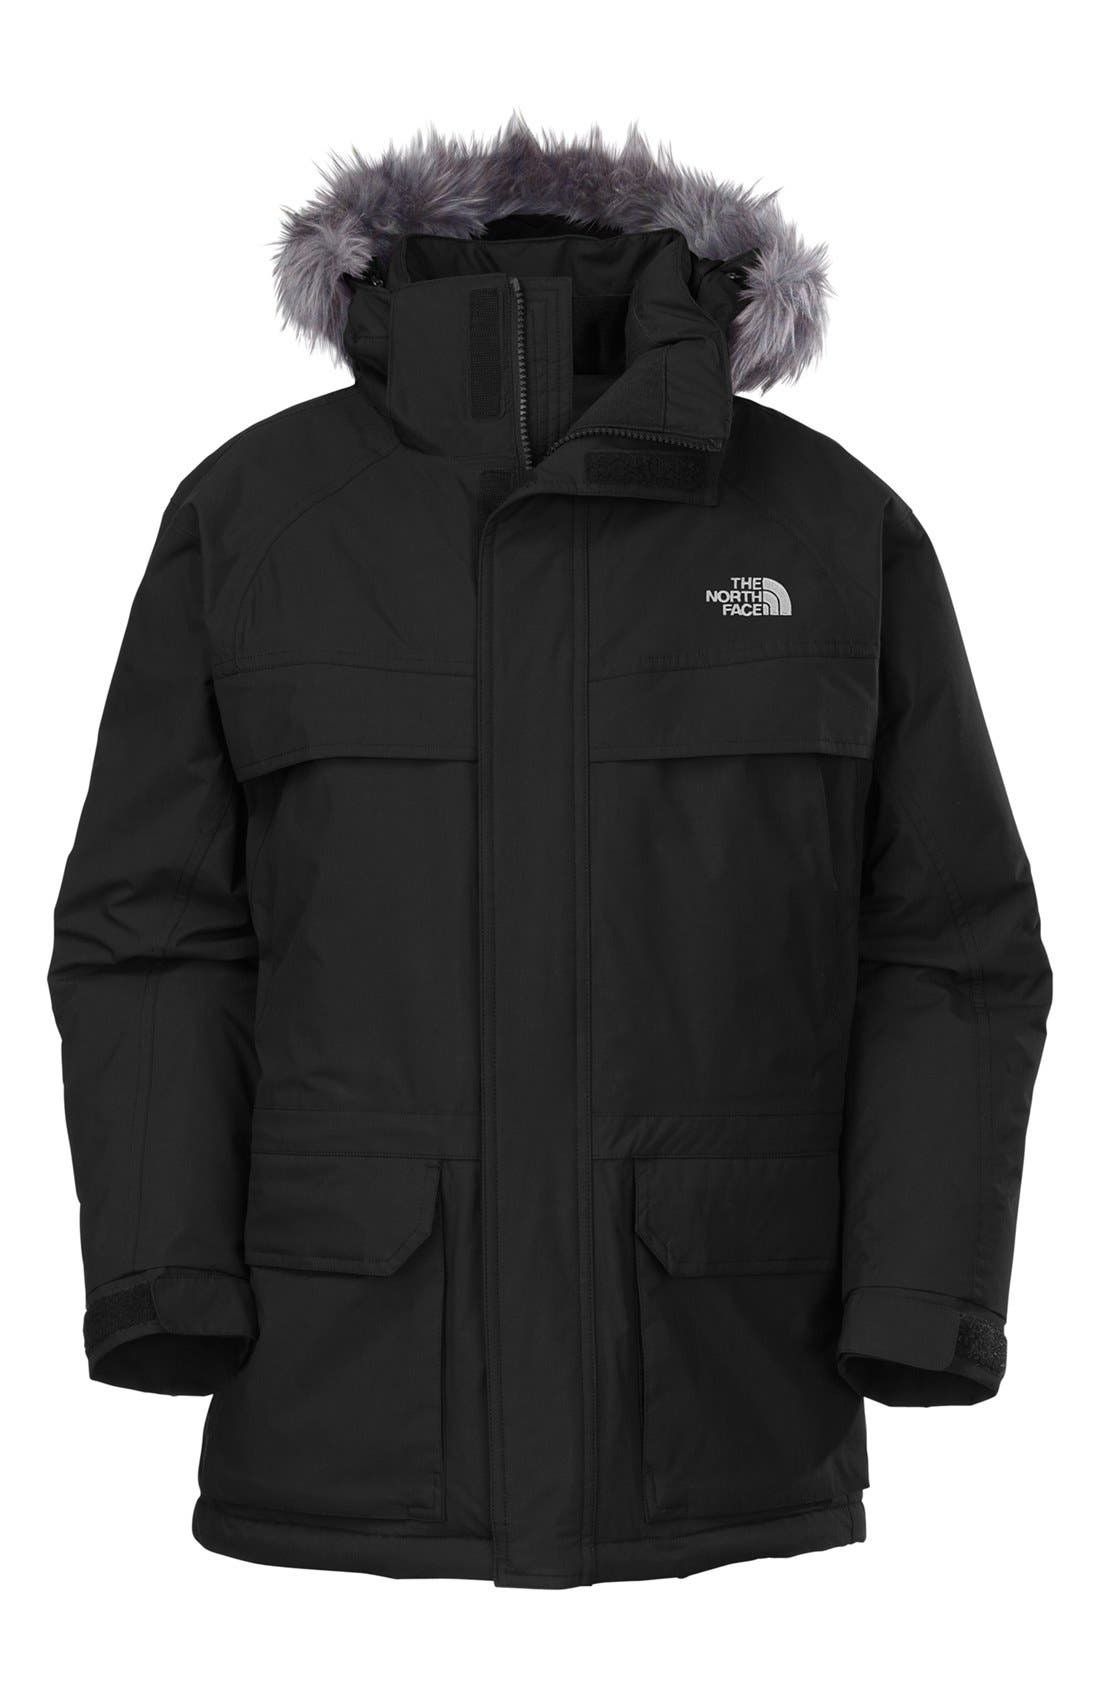 Main Image - The North Face 'McMurdo' HyVent® Waterproof Heatseeker Parka with Faux Fur Trim (Big Boys)